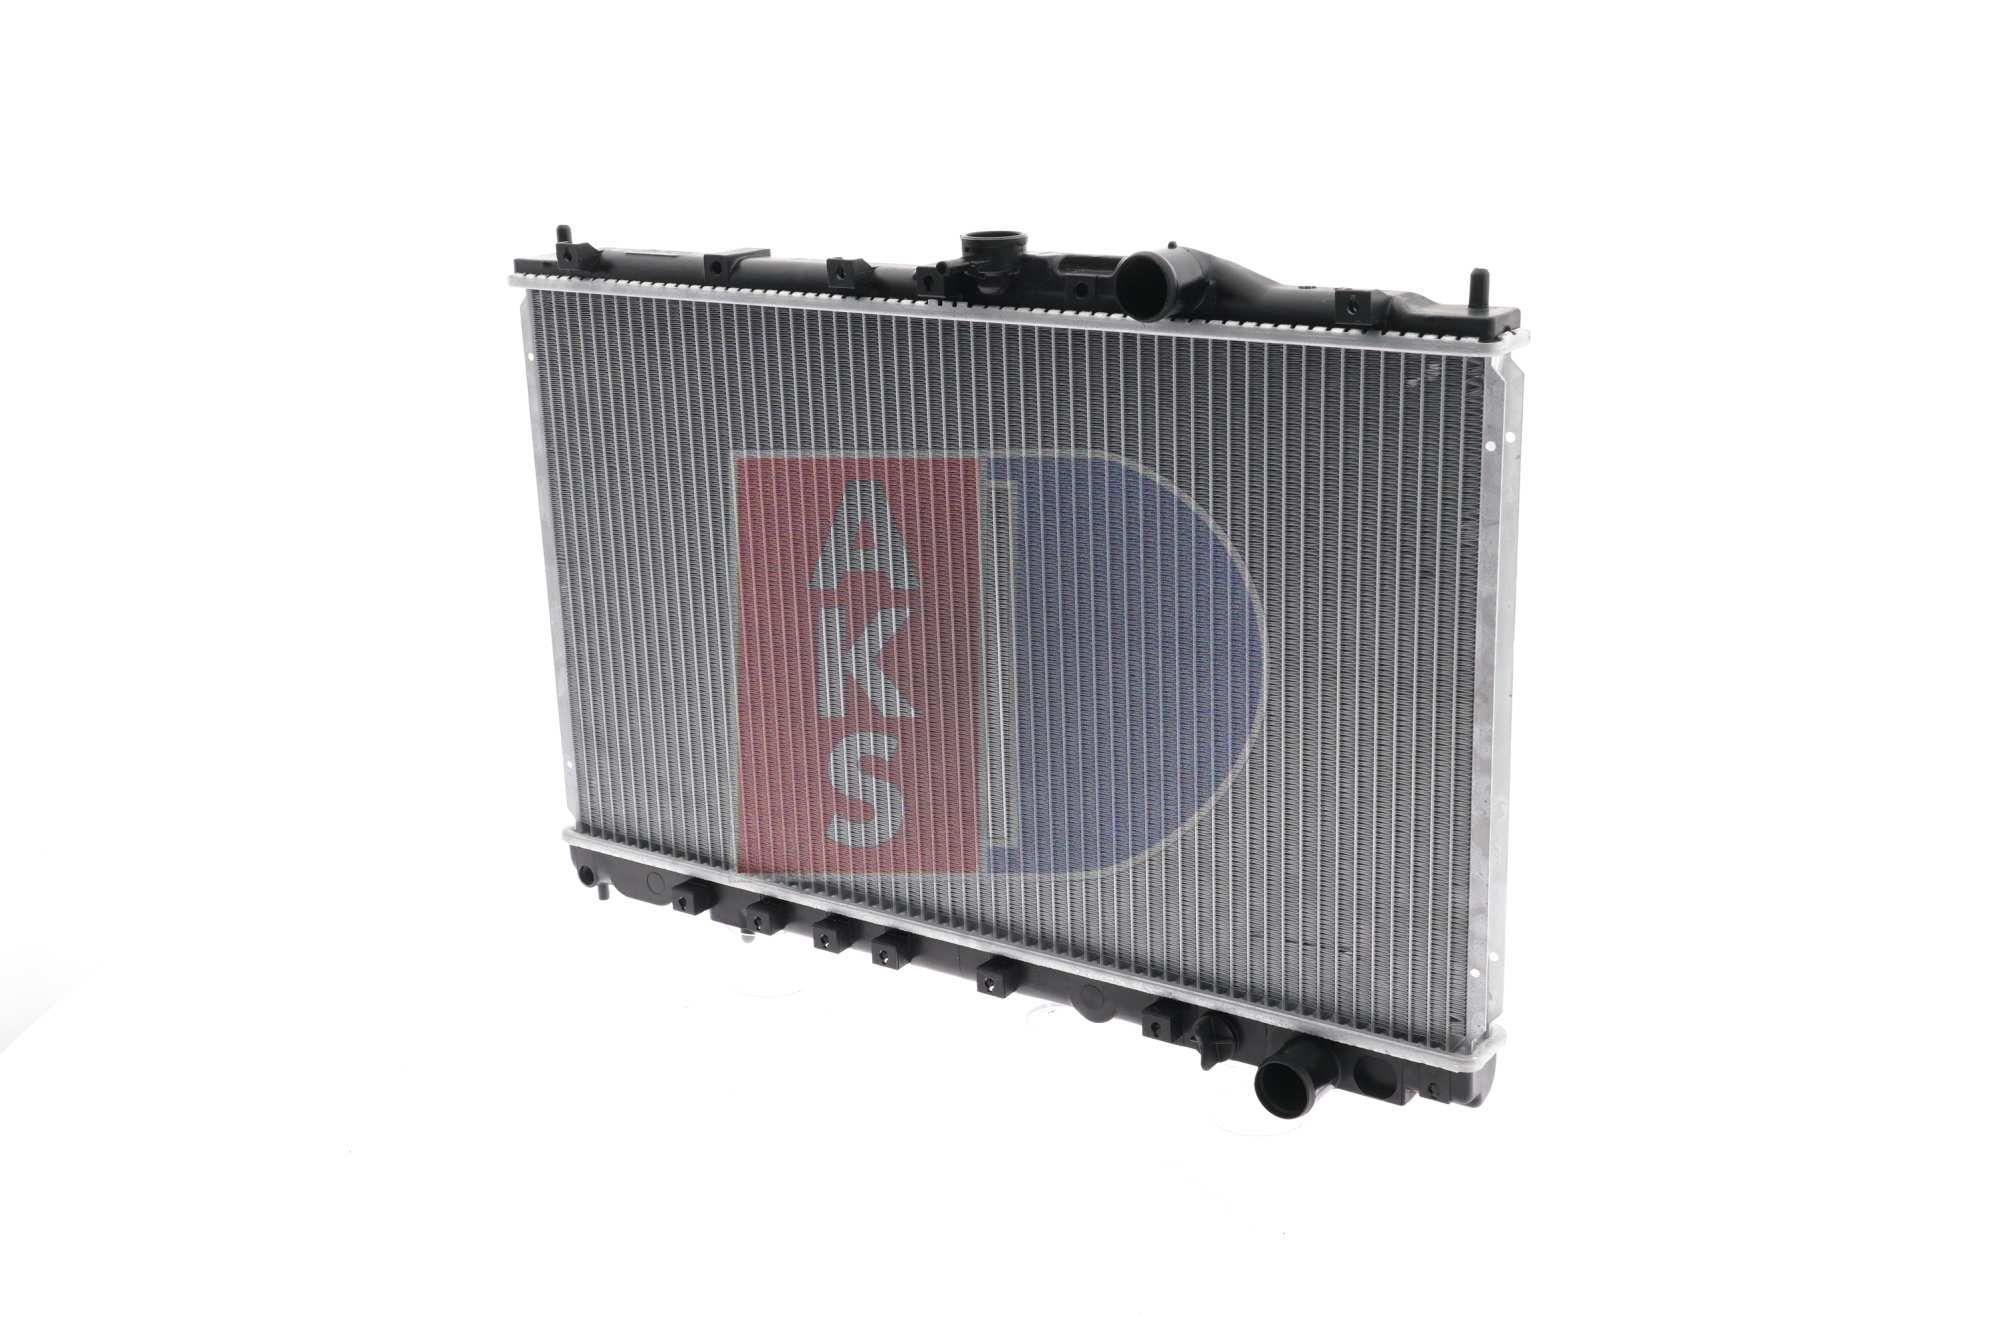 140100N AKS DASIS Kühlrippen gelötet Netzmaße: 375x660x27 Kühler, Motorkühlung 140100N günstig kaufen